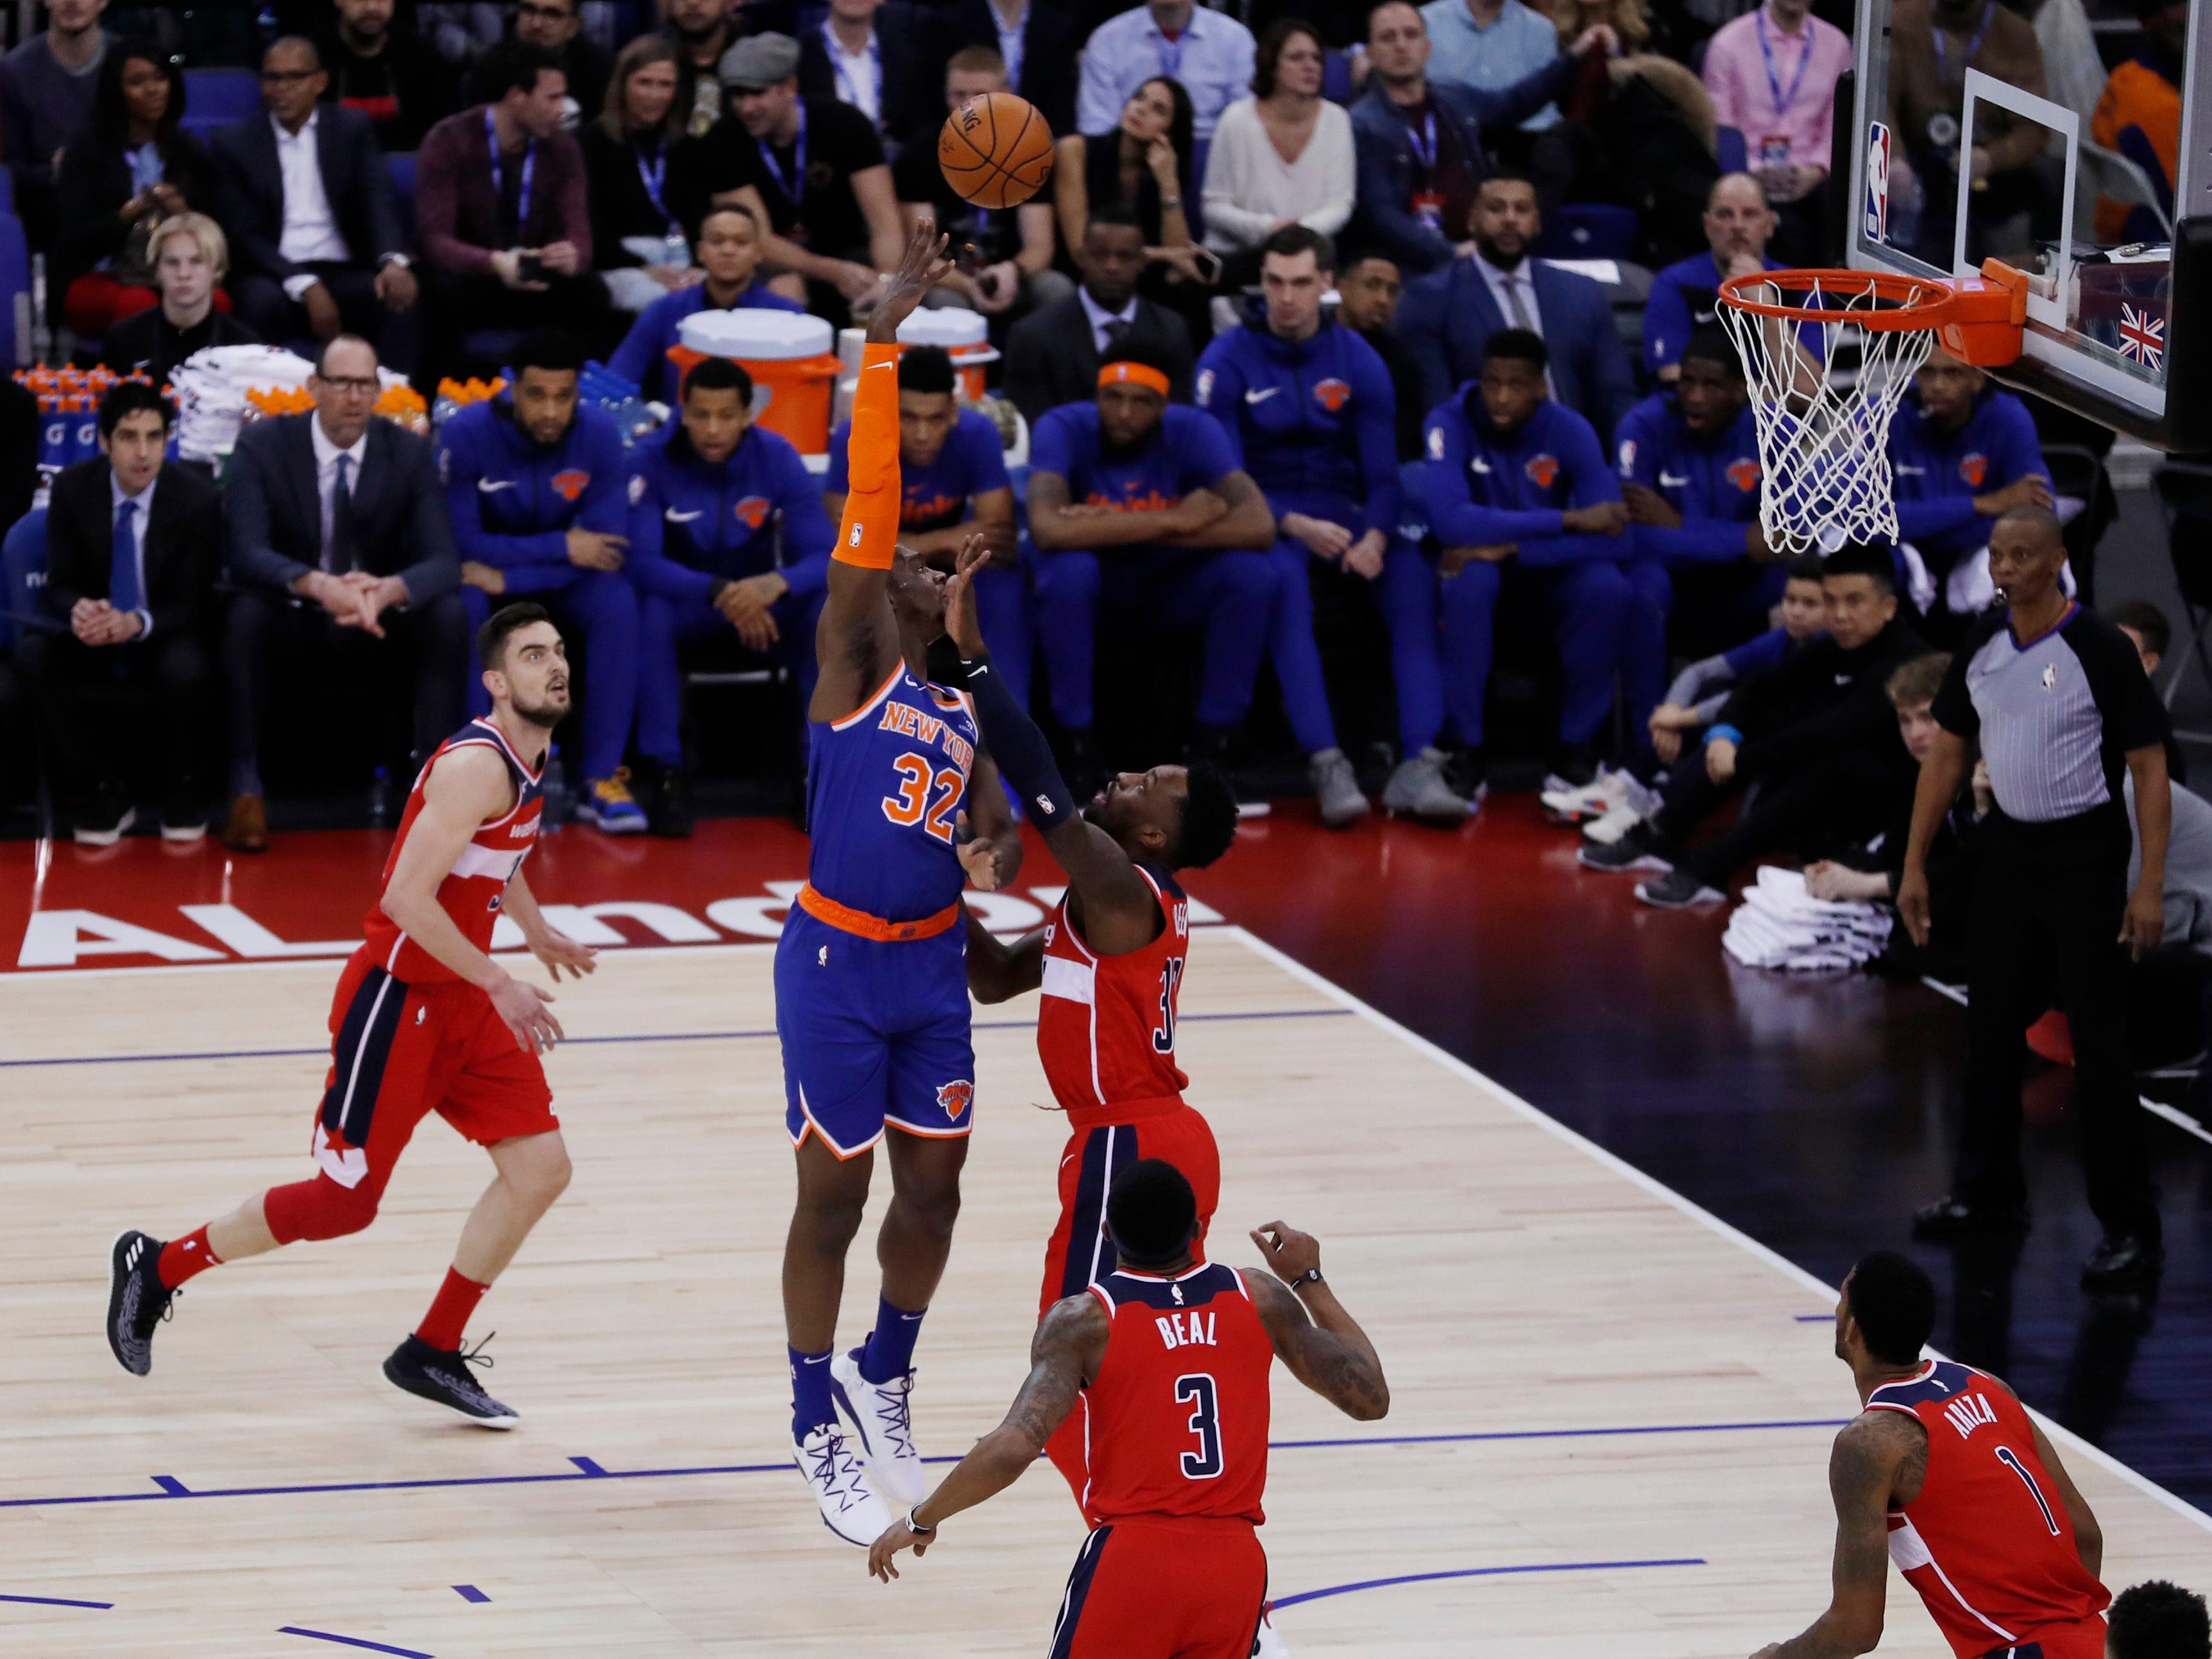 New York Knicks forward Noah Vonleh (32) shoots during an NBA basketball game between New York Knicks and Washington Wizards at the O2 Arena, in London, Thursday, Jan.17, 2019.